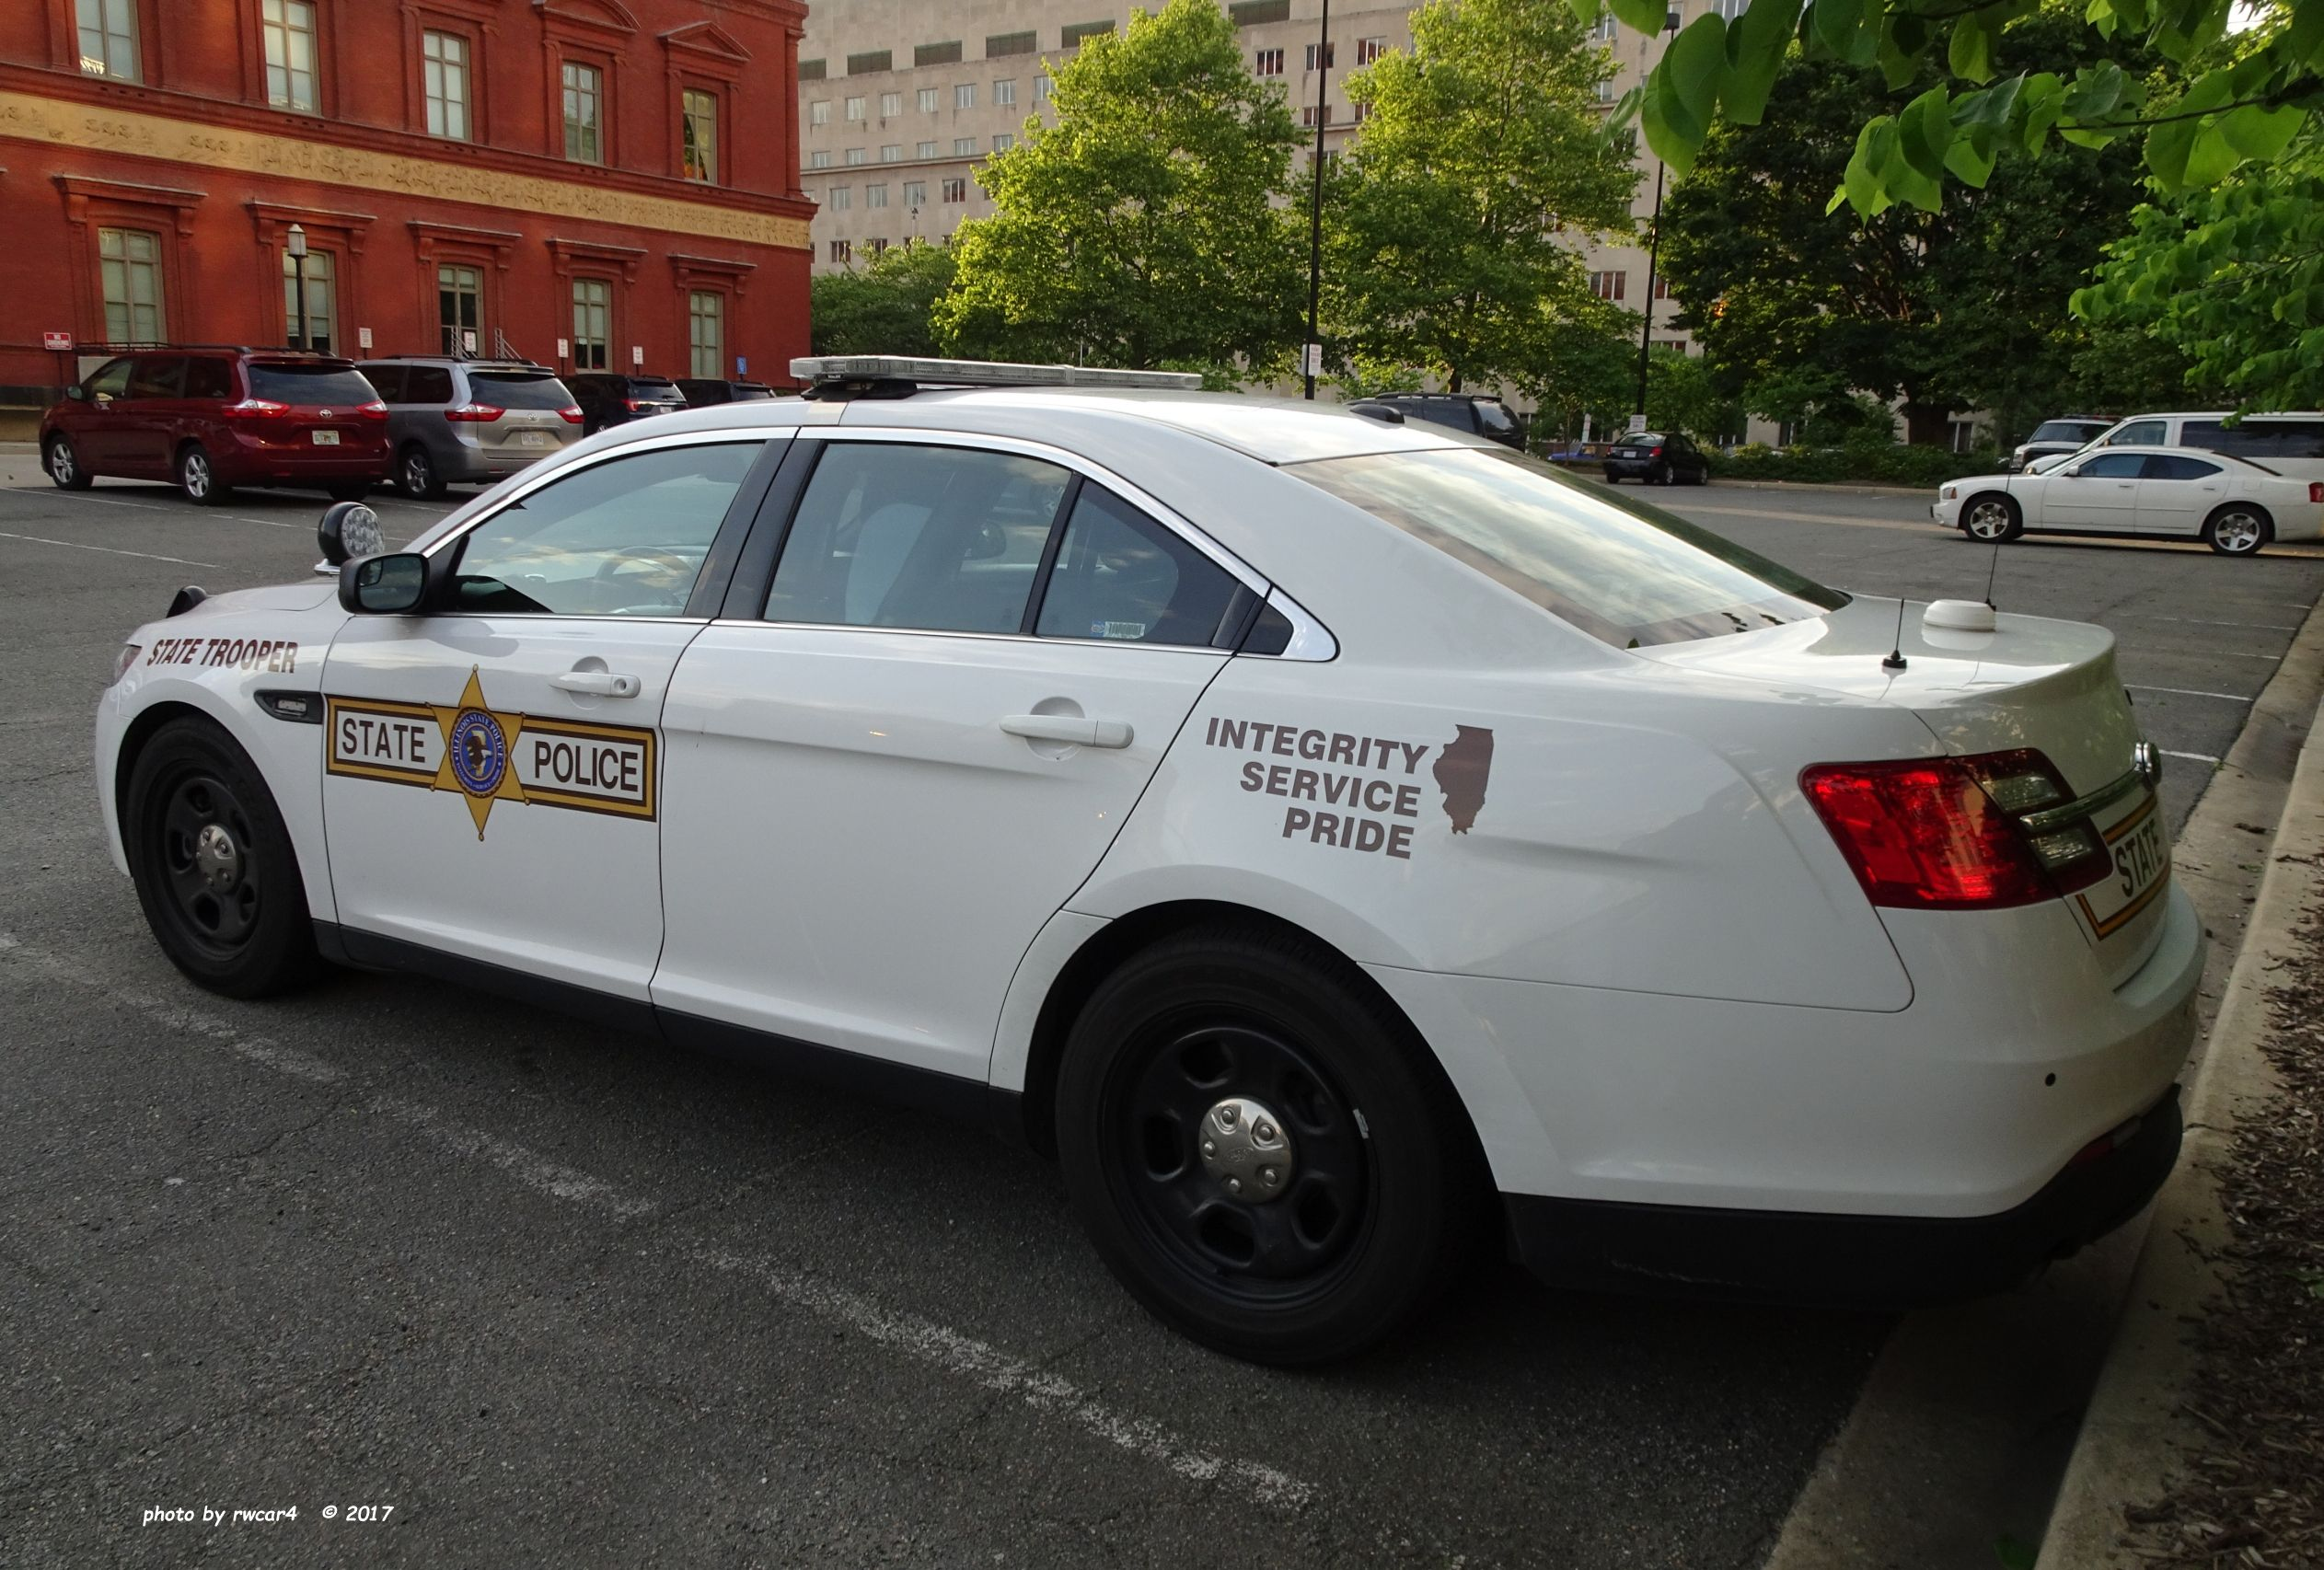 Illinois State Police 2017 Ford Police Interceptor Sedan Ford Police State Police Police Cars